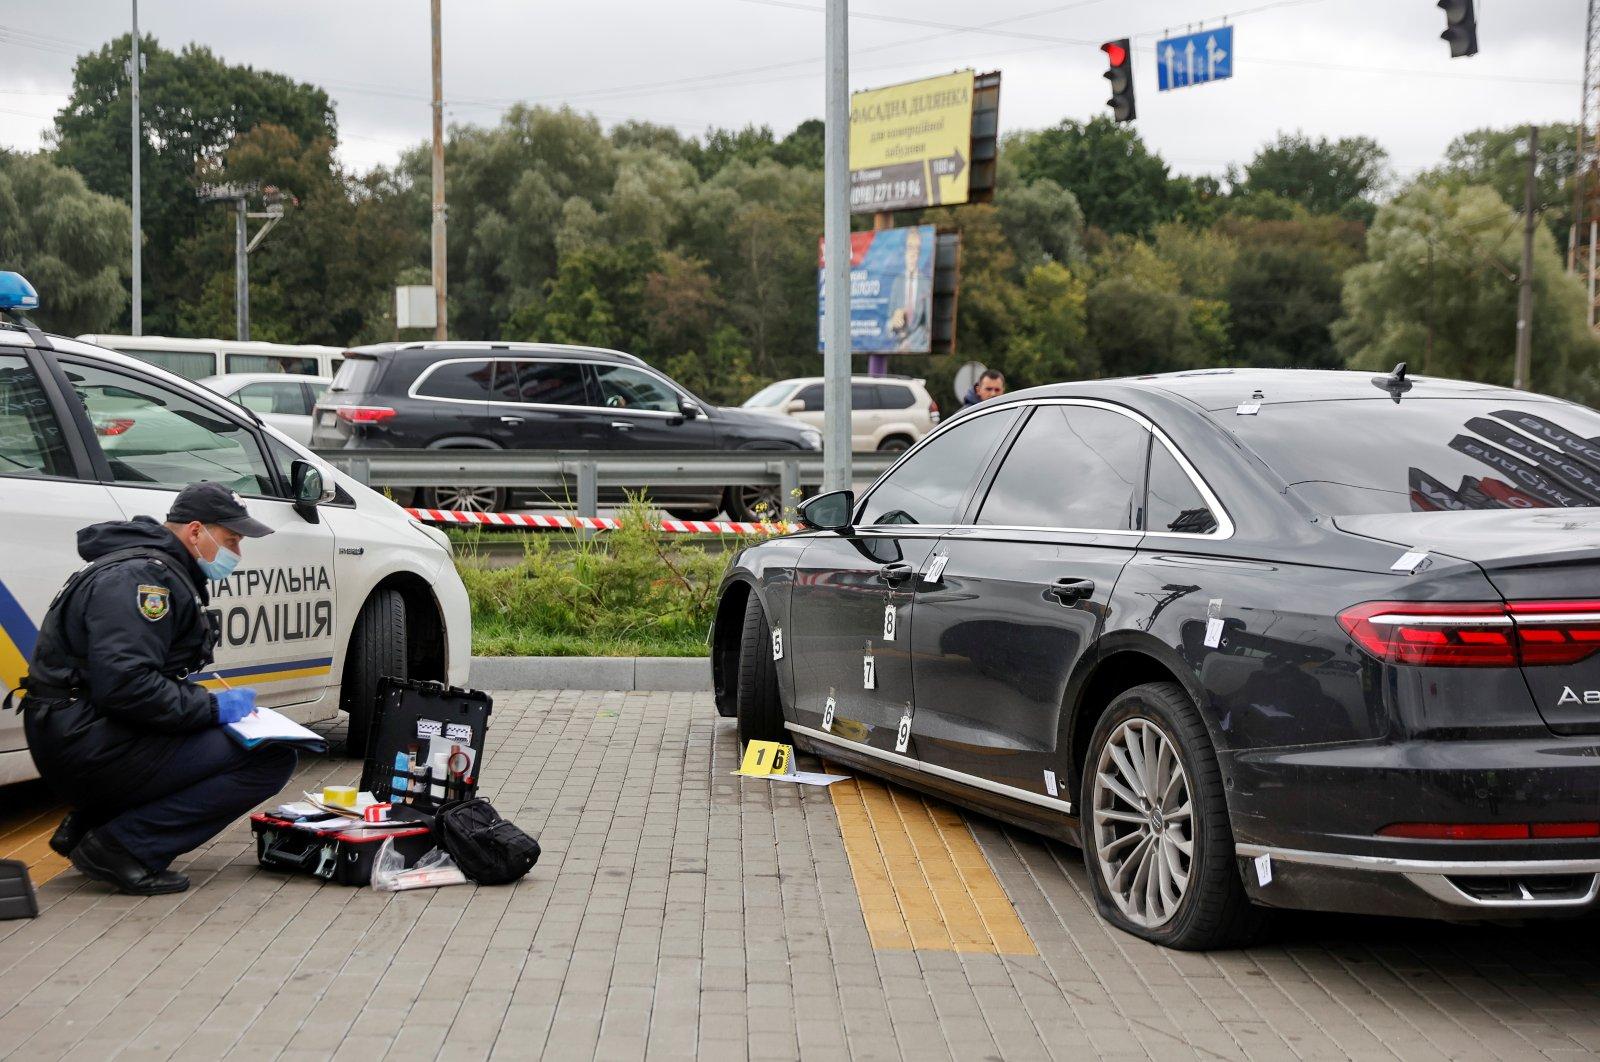 An investigator examines bullet holes in a car of Serhiy Shefir, Ukrainian President Volodymyr Zelenskyy's principal aide, following an assault outside the capital Kyiv, Ukraine September 22, 2021. (Reuters Photo)